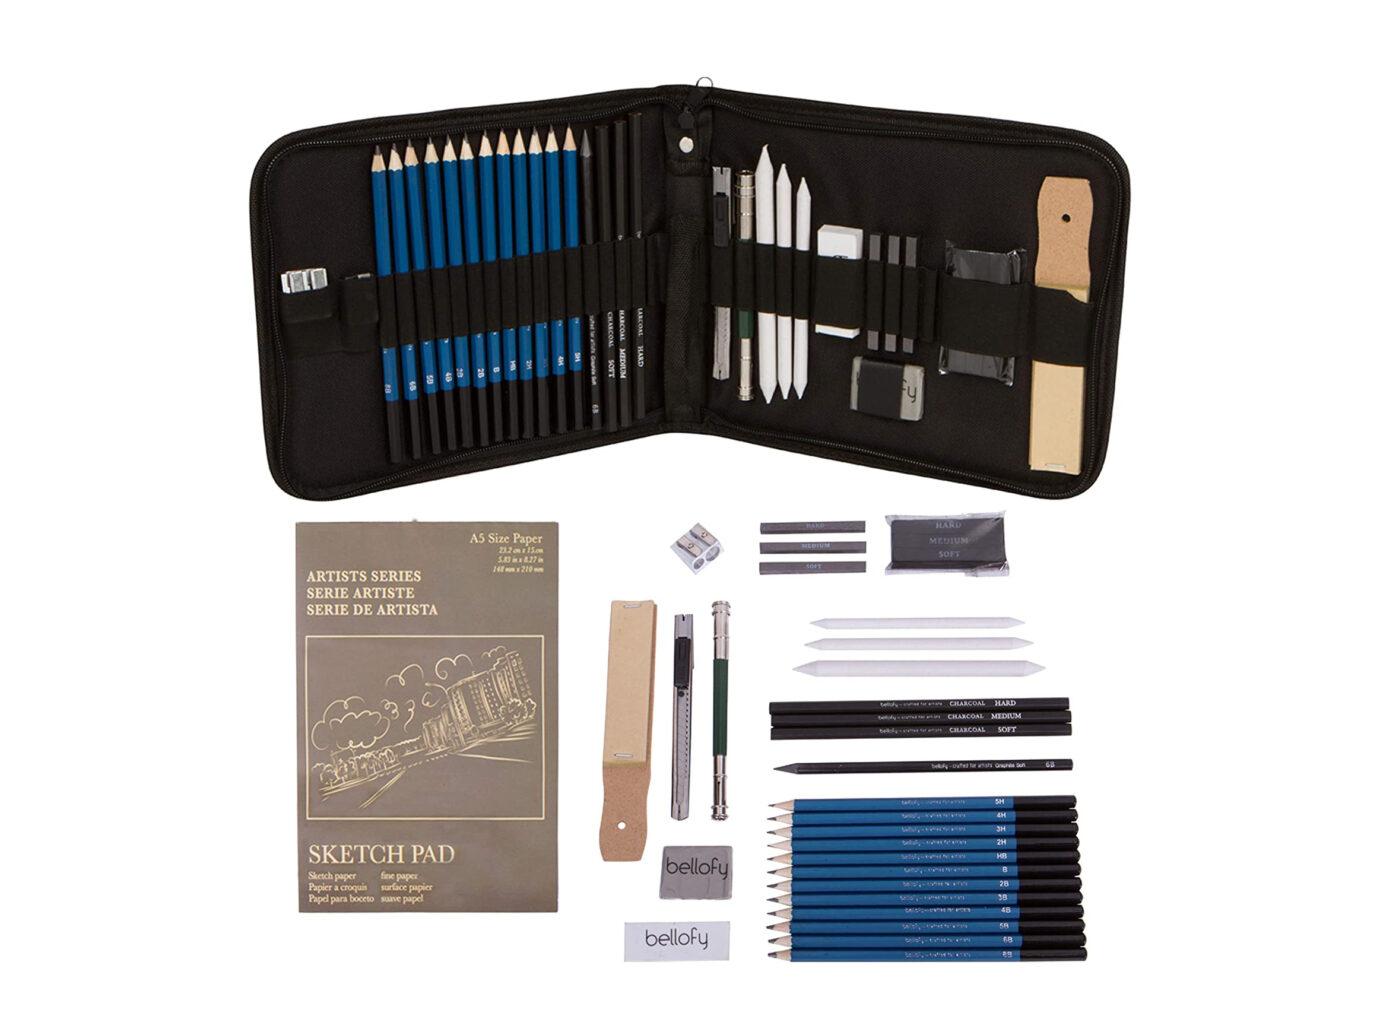 Bellofy Professional Drawing Kit